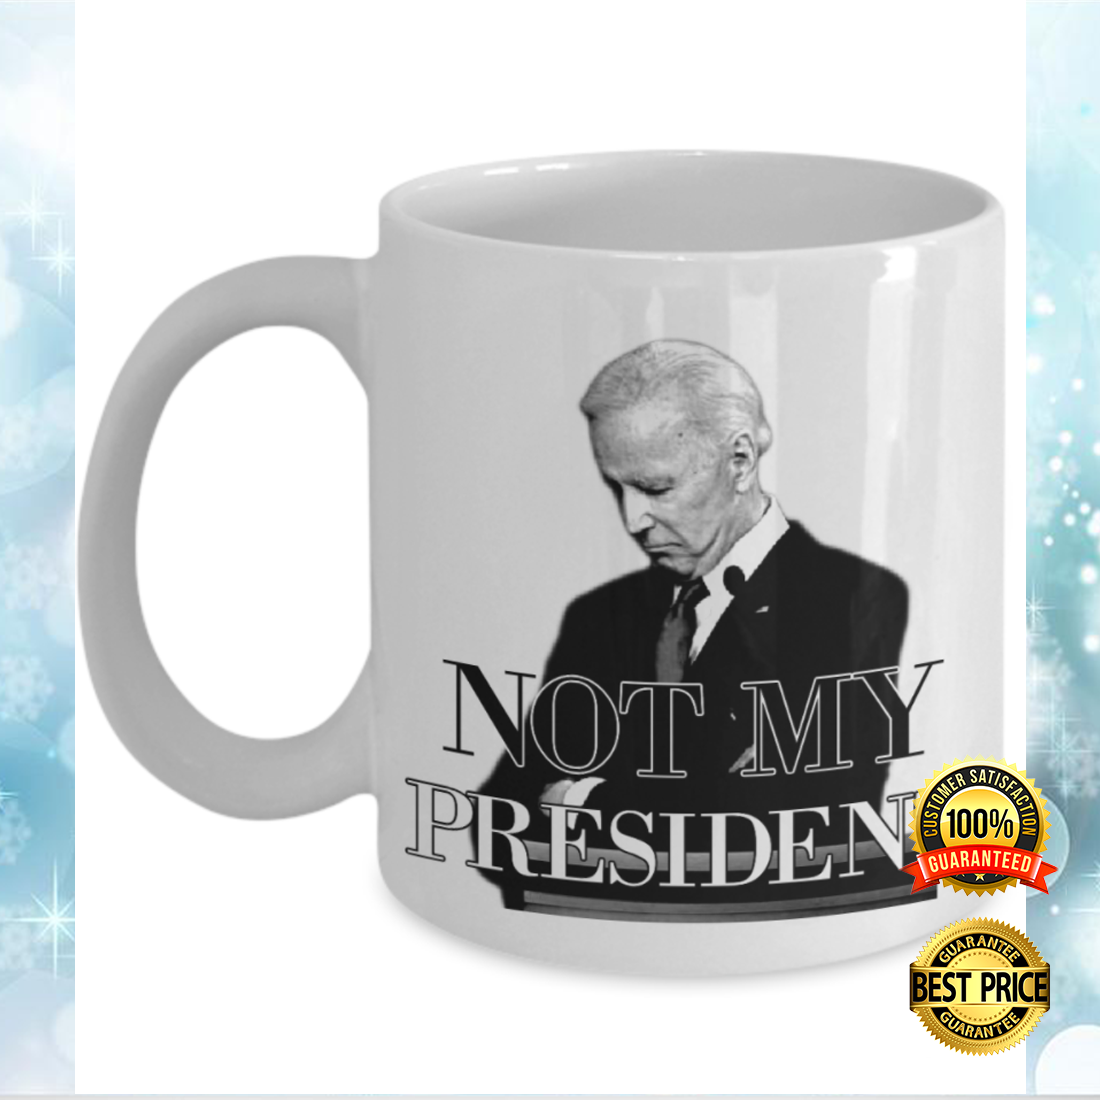 Biden not my president mug 2